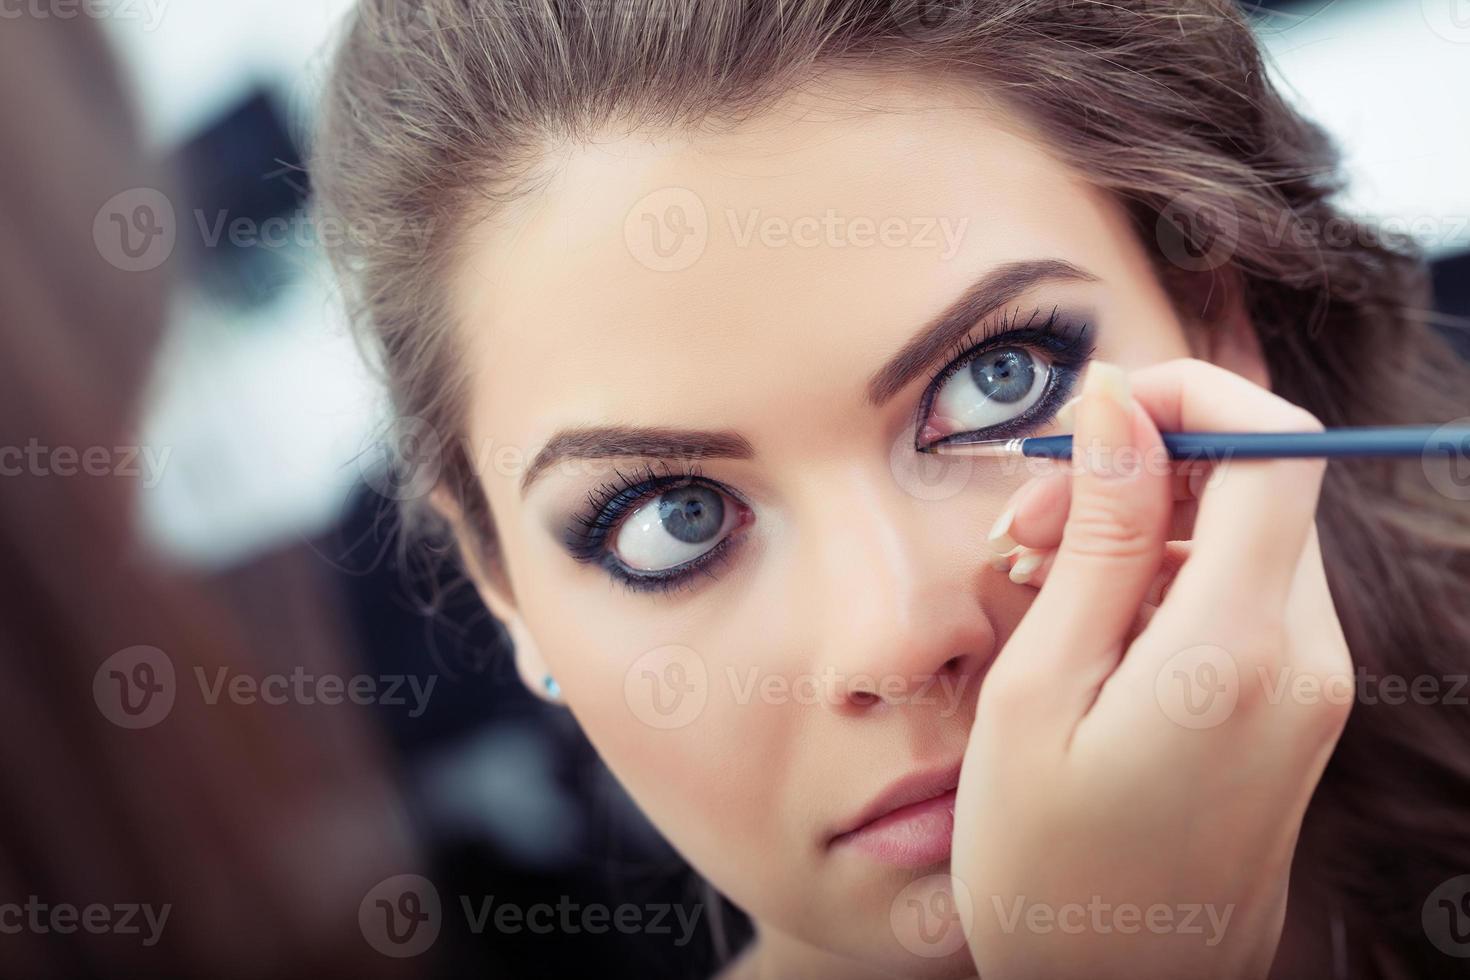 applicare eyeliner liquido foto